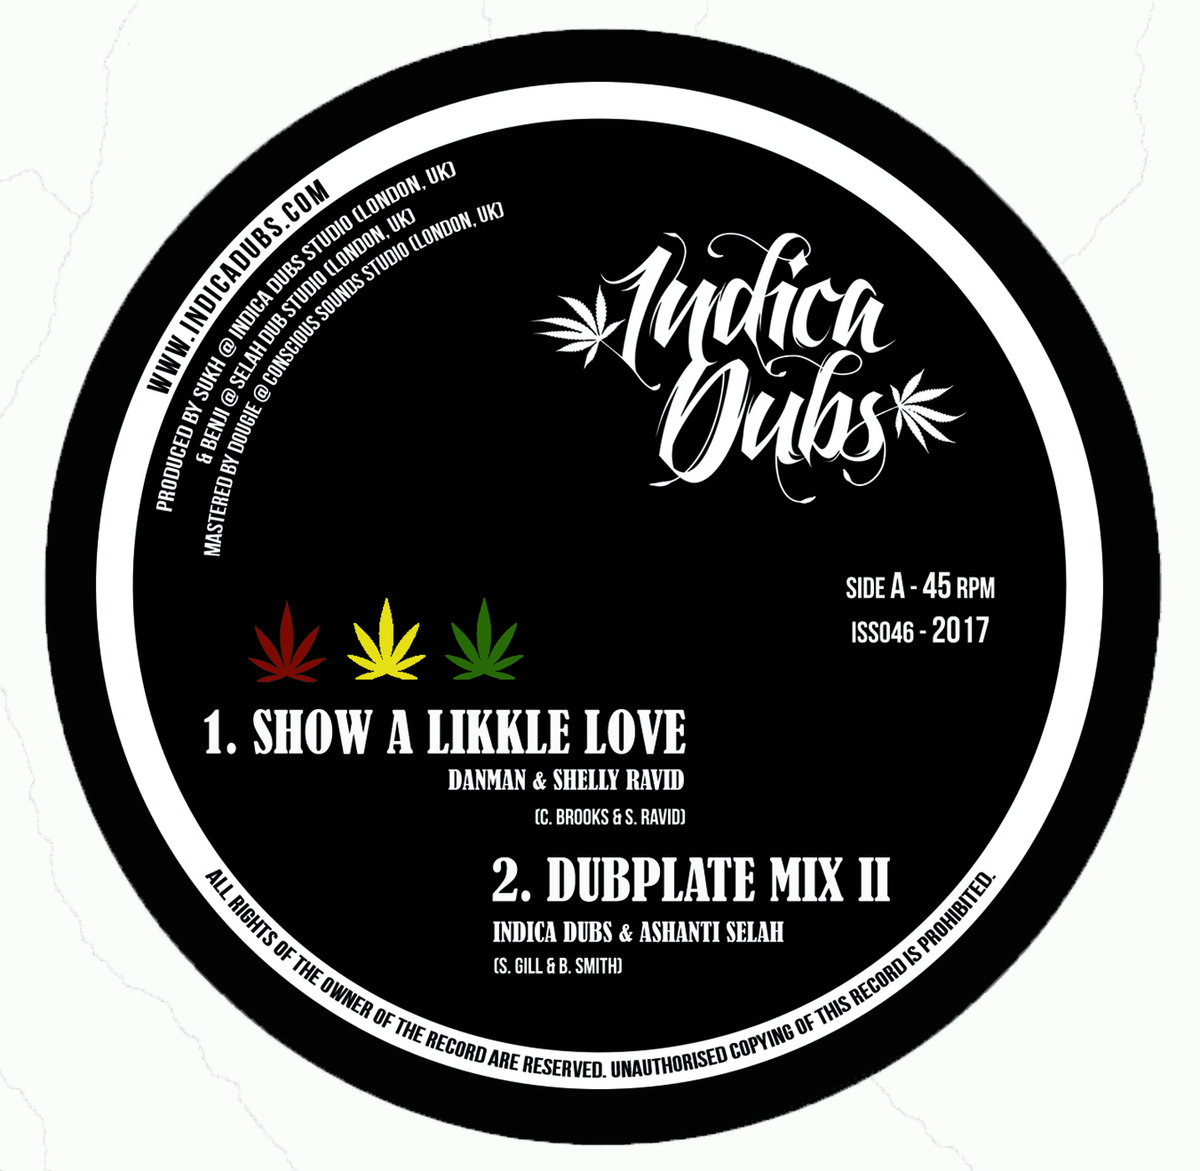 danman show a likkle love